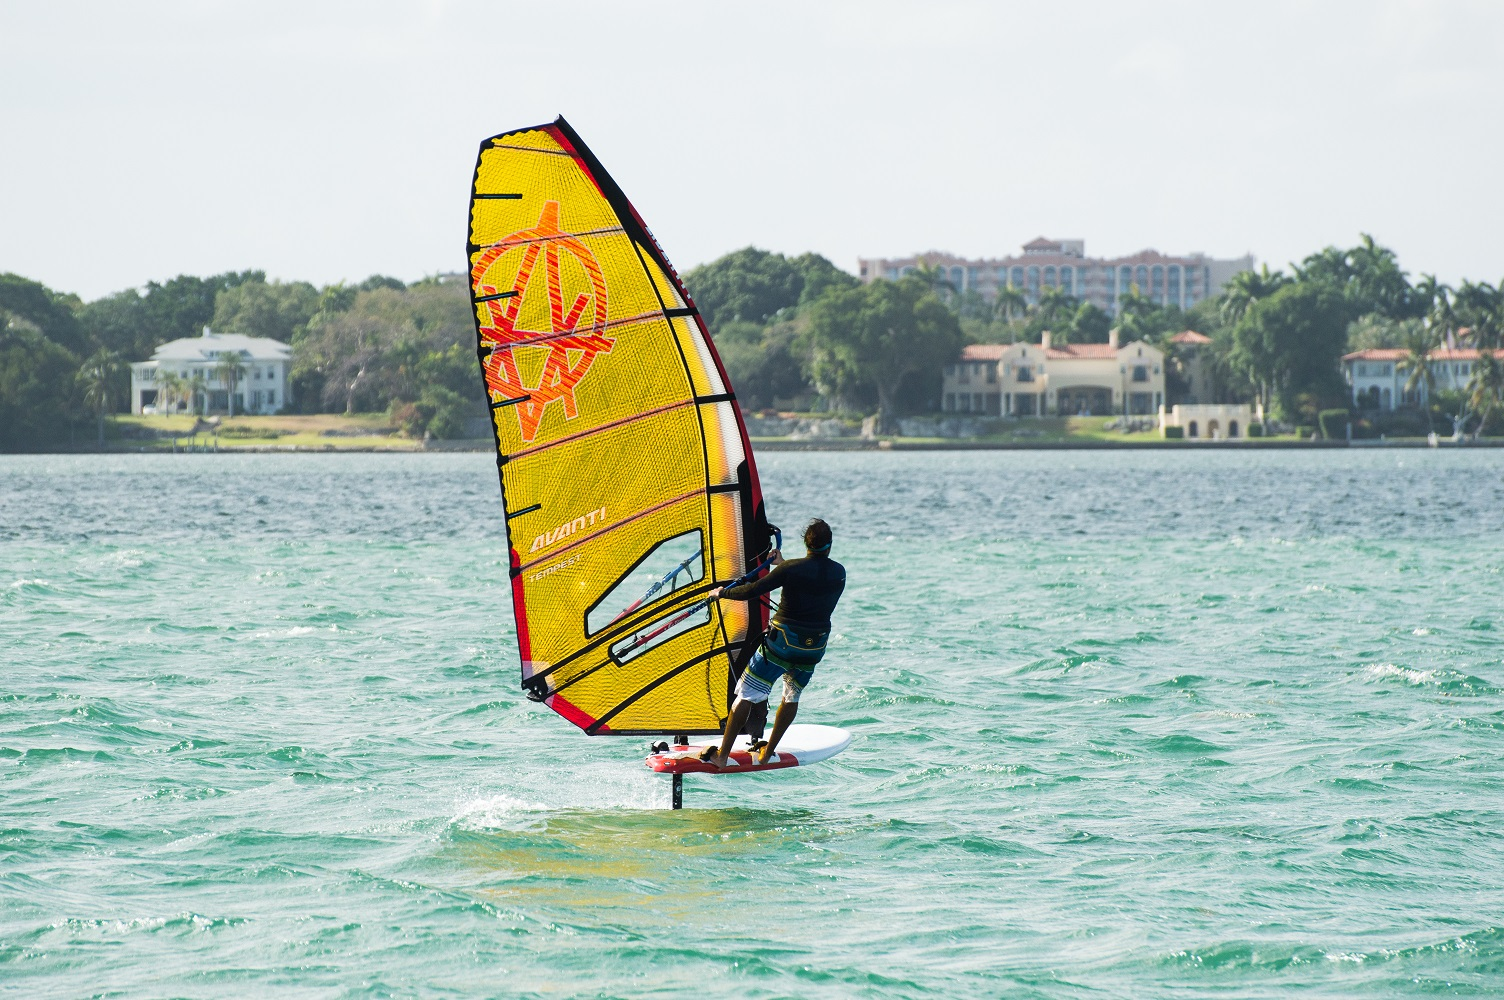 Tillo on Avanti sails small